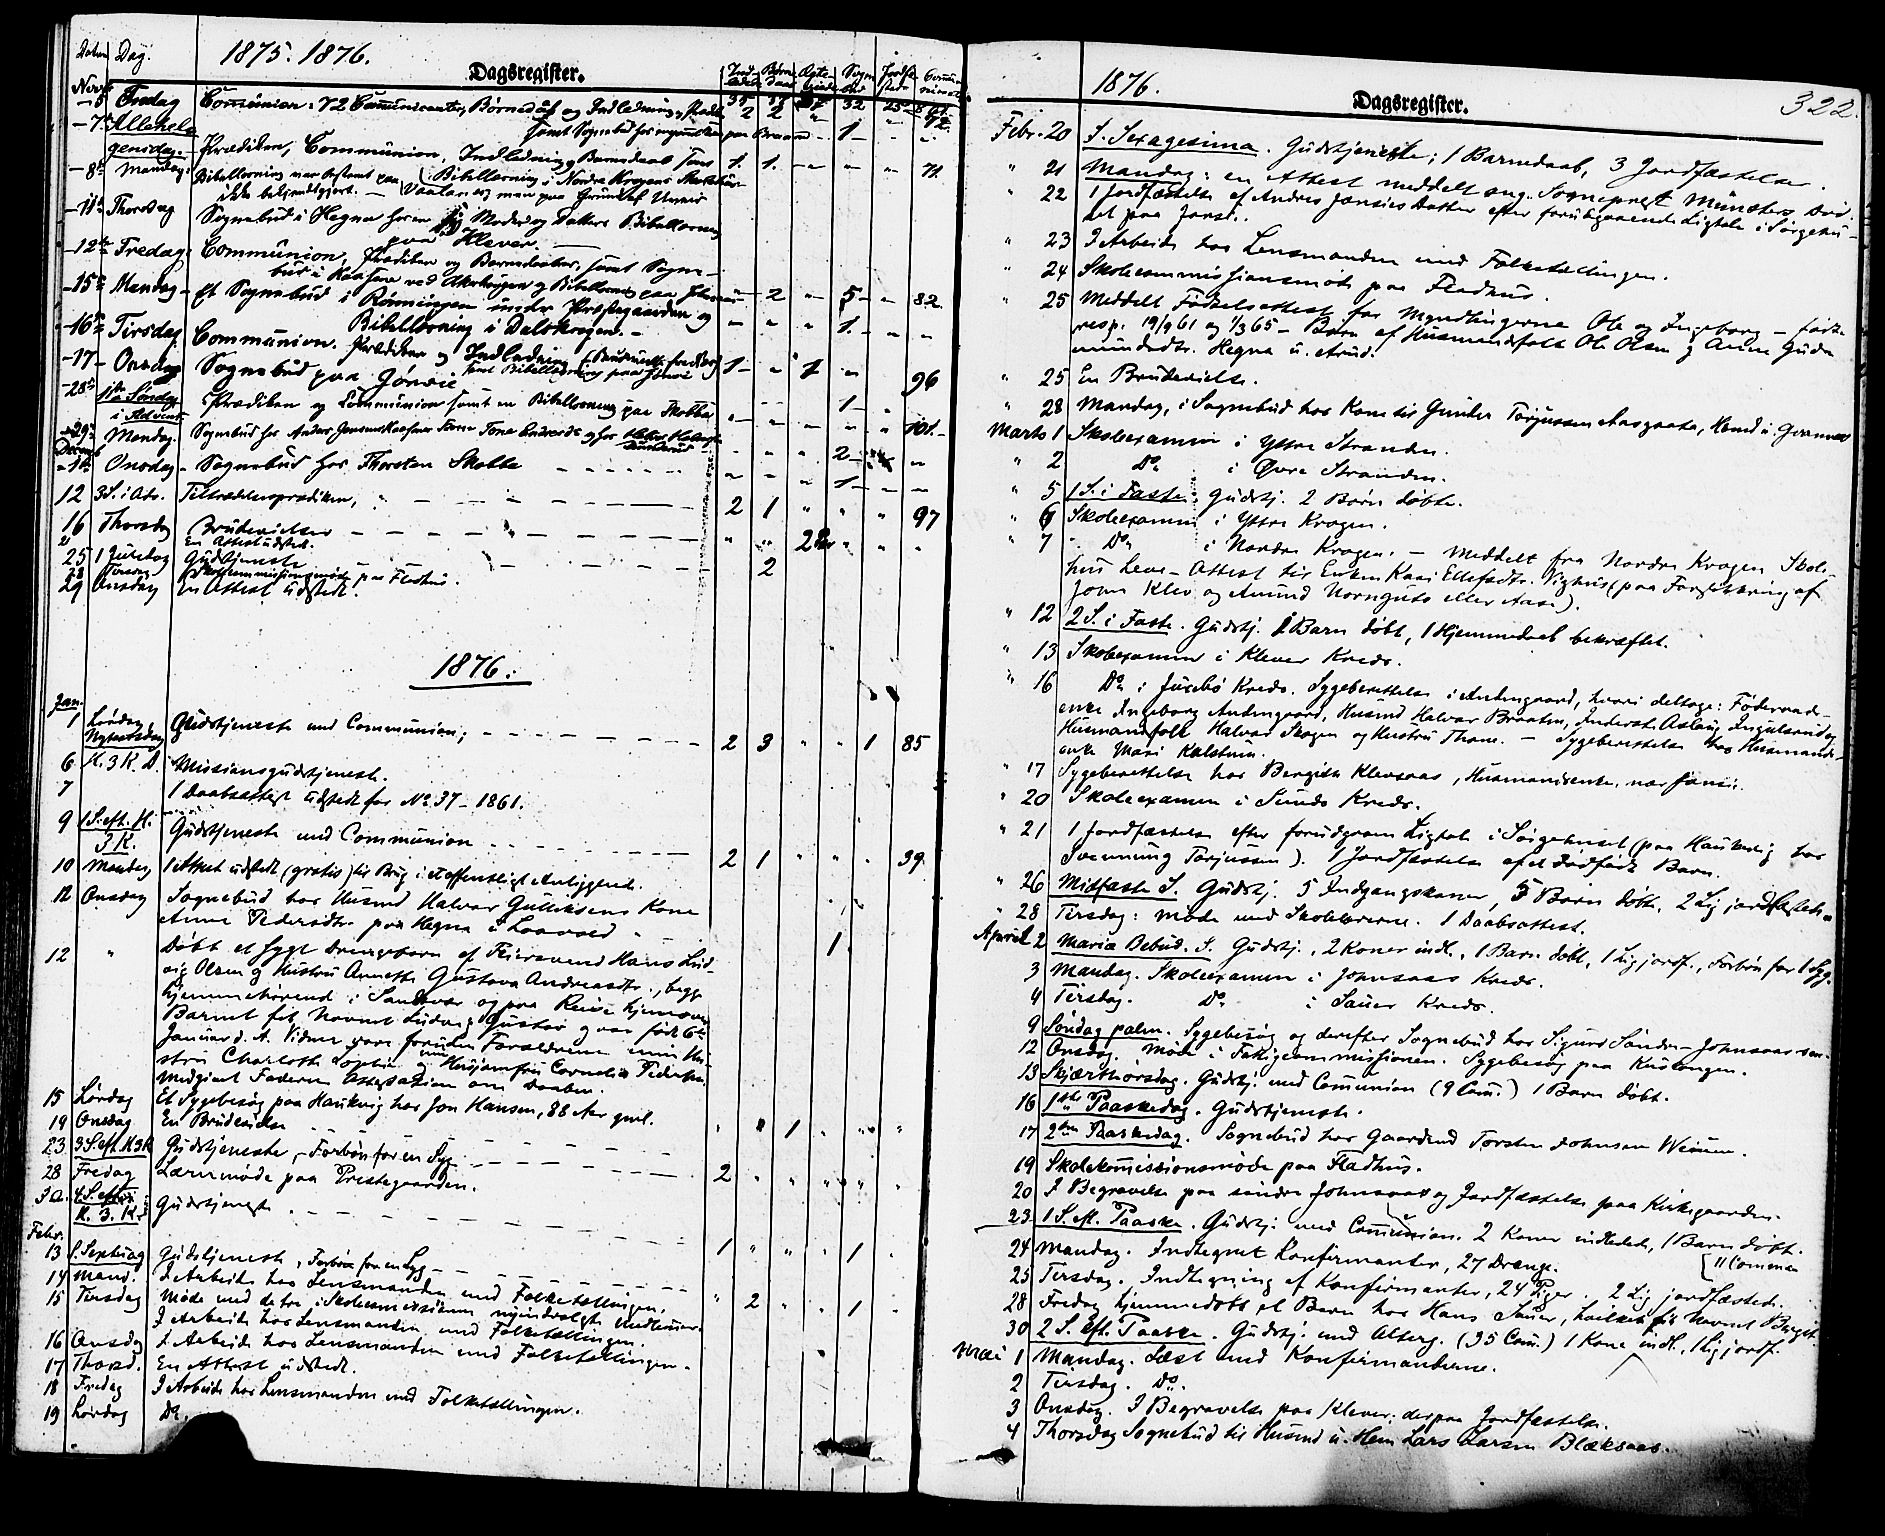 SAKO, Sauherad kirkebøker, F/Fa/L0008: Ministerialbok nr. I 8, 1873-1886, s. 322